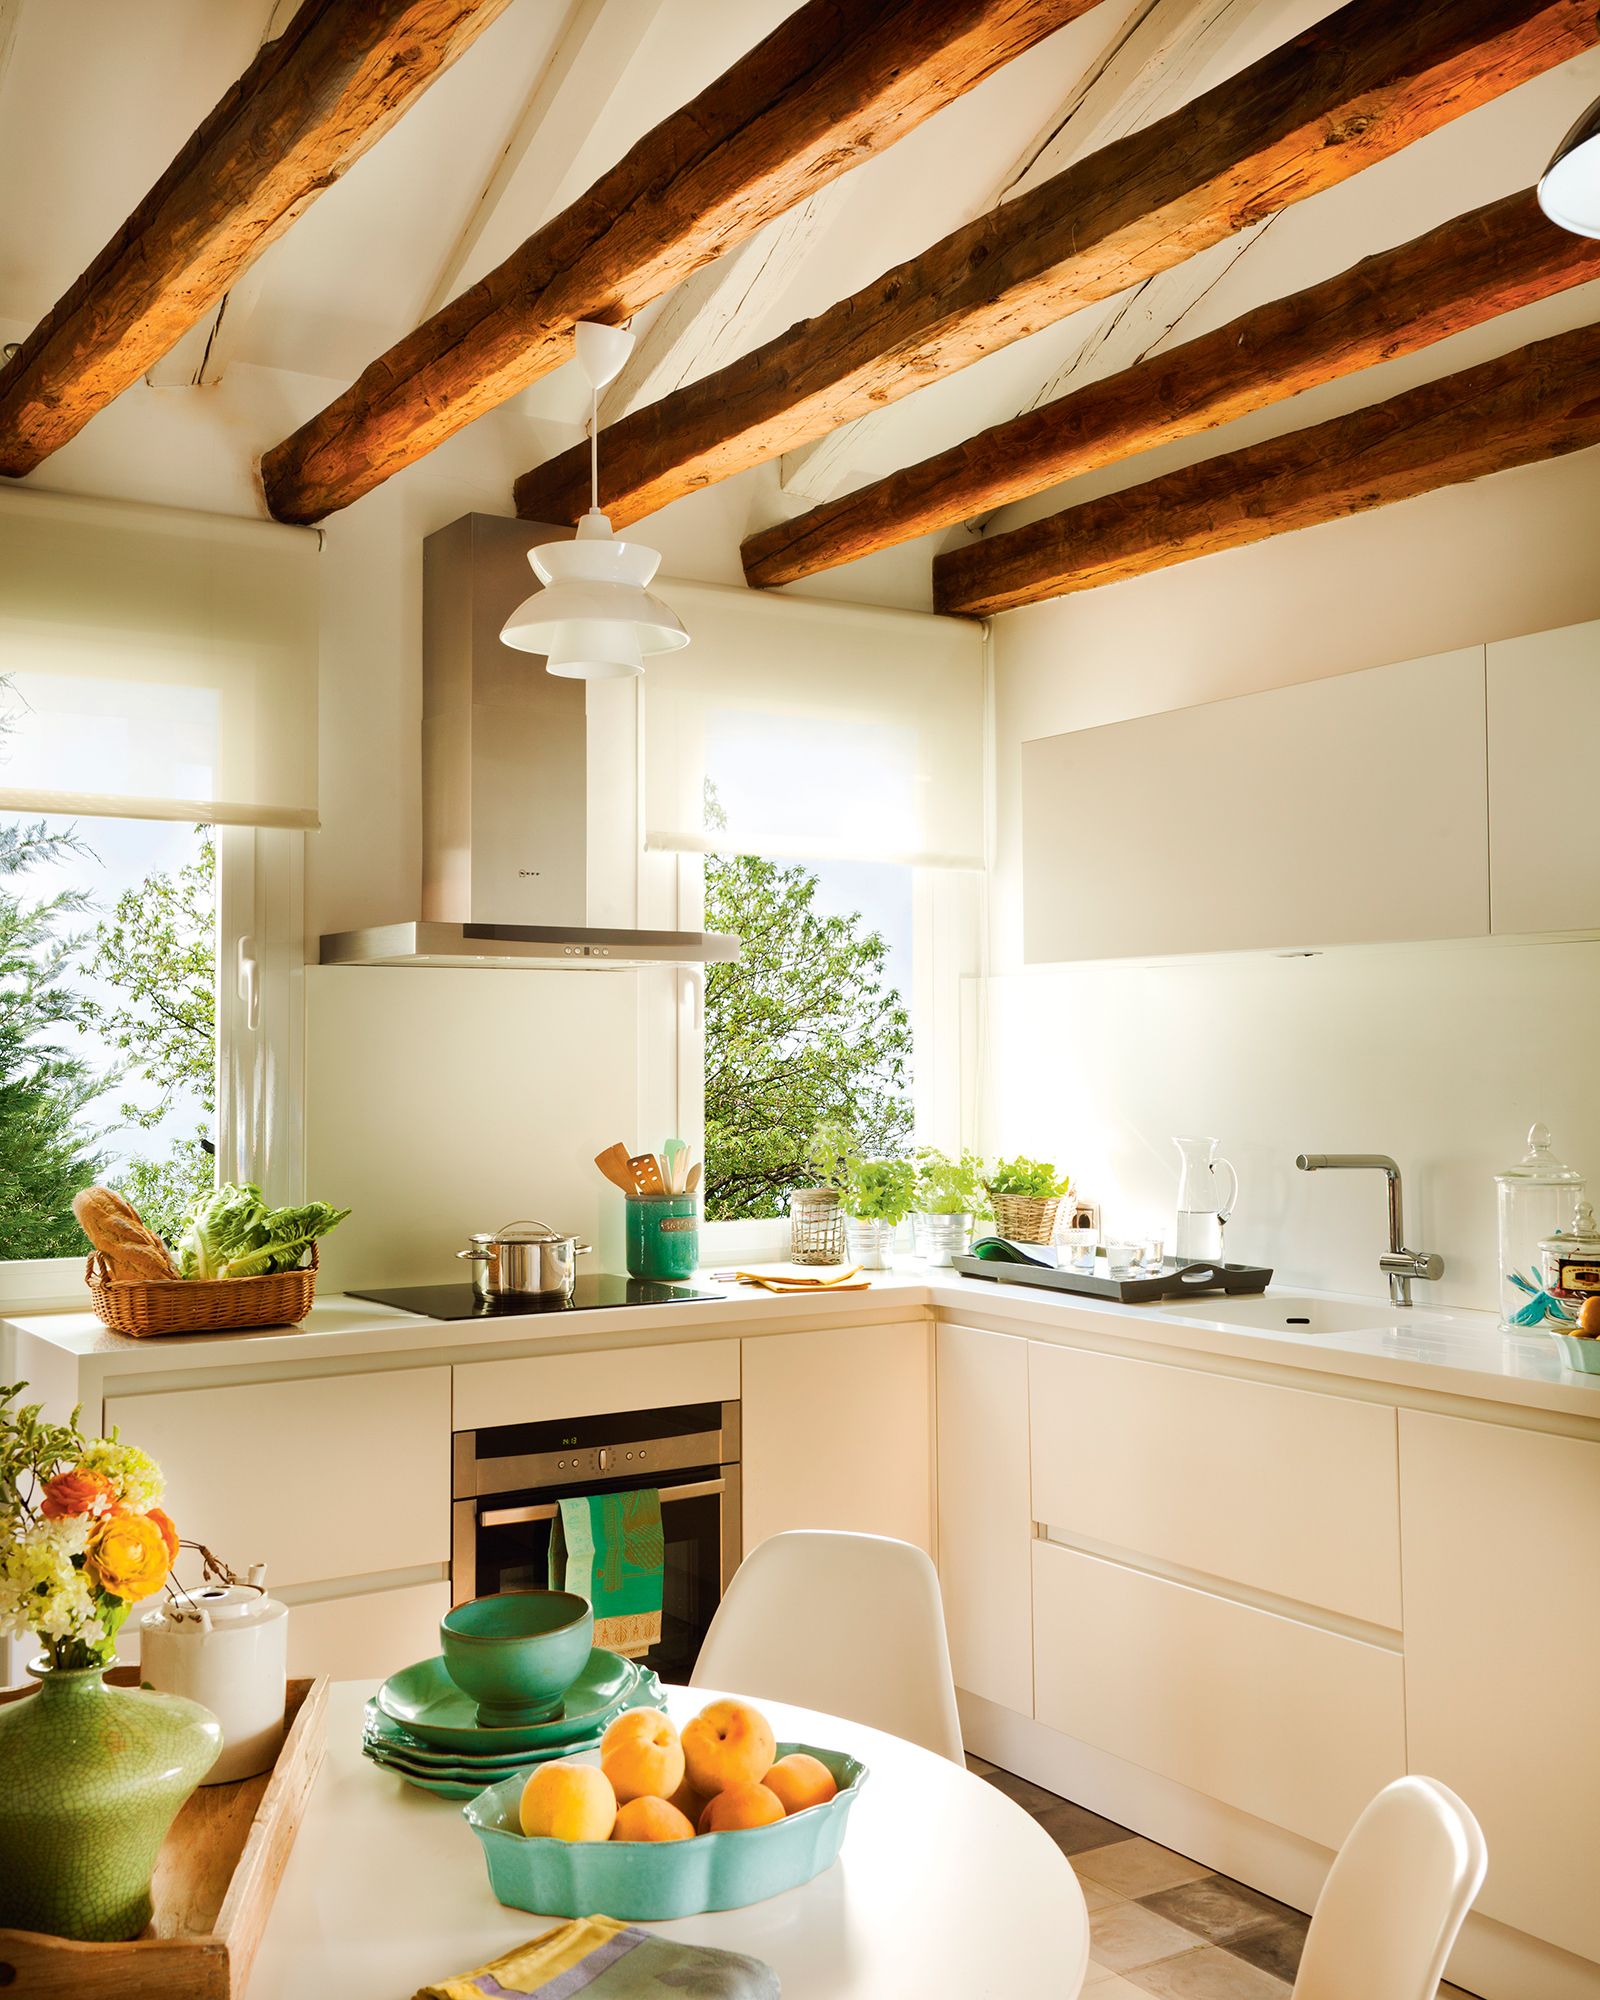 Cocinas peque as distribuidas en l - Vigas de madera redondas ...